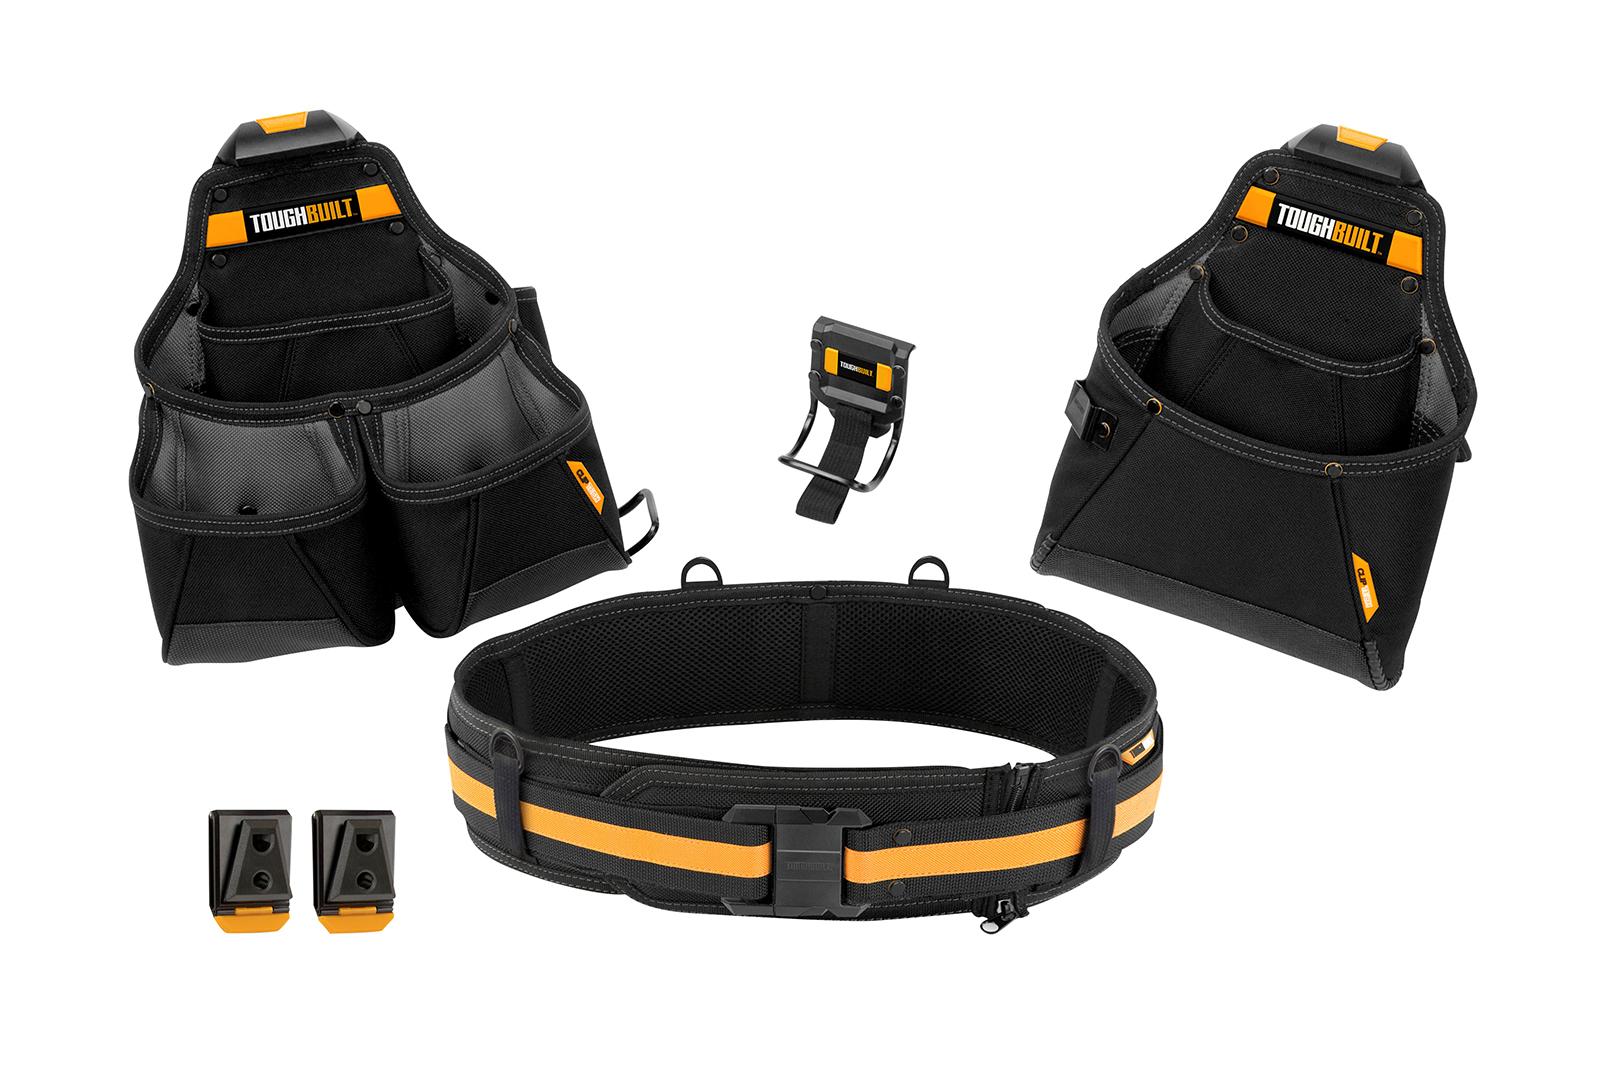 Toughbuilt 4 piece tool belt set up for grabs